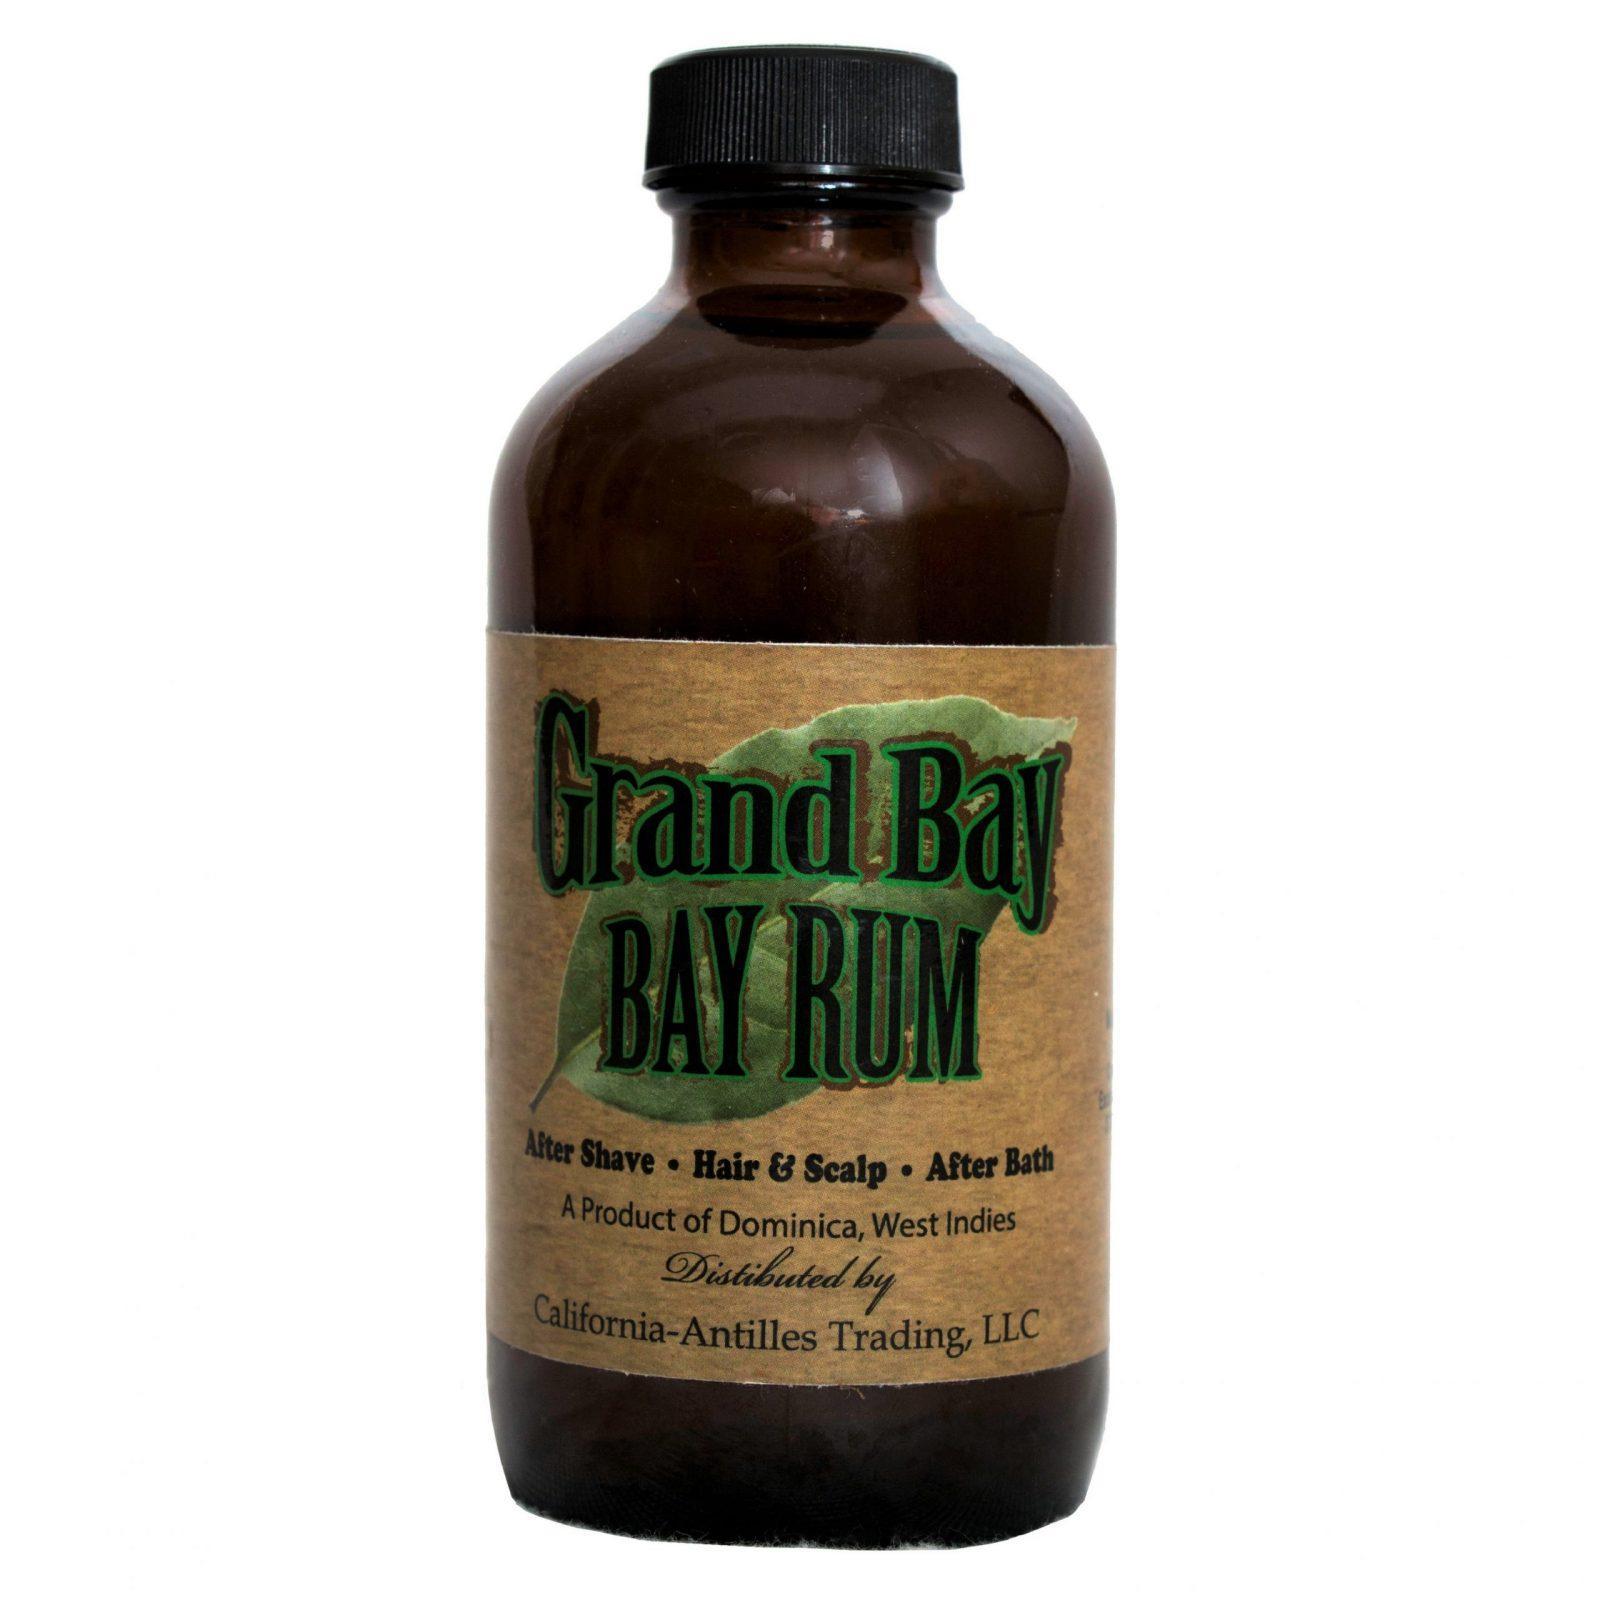 Grand Bay Bay Rum 8oz C